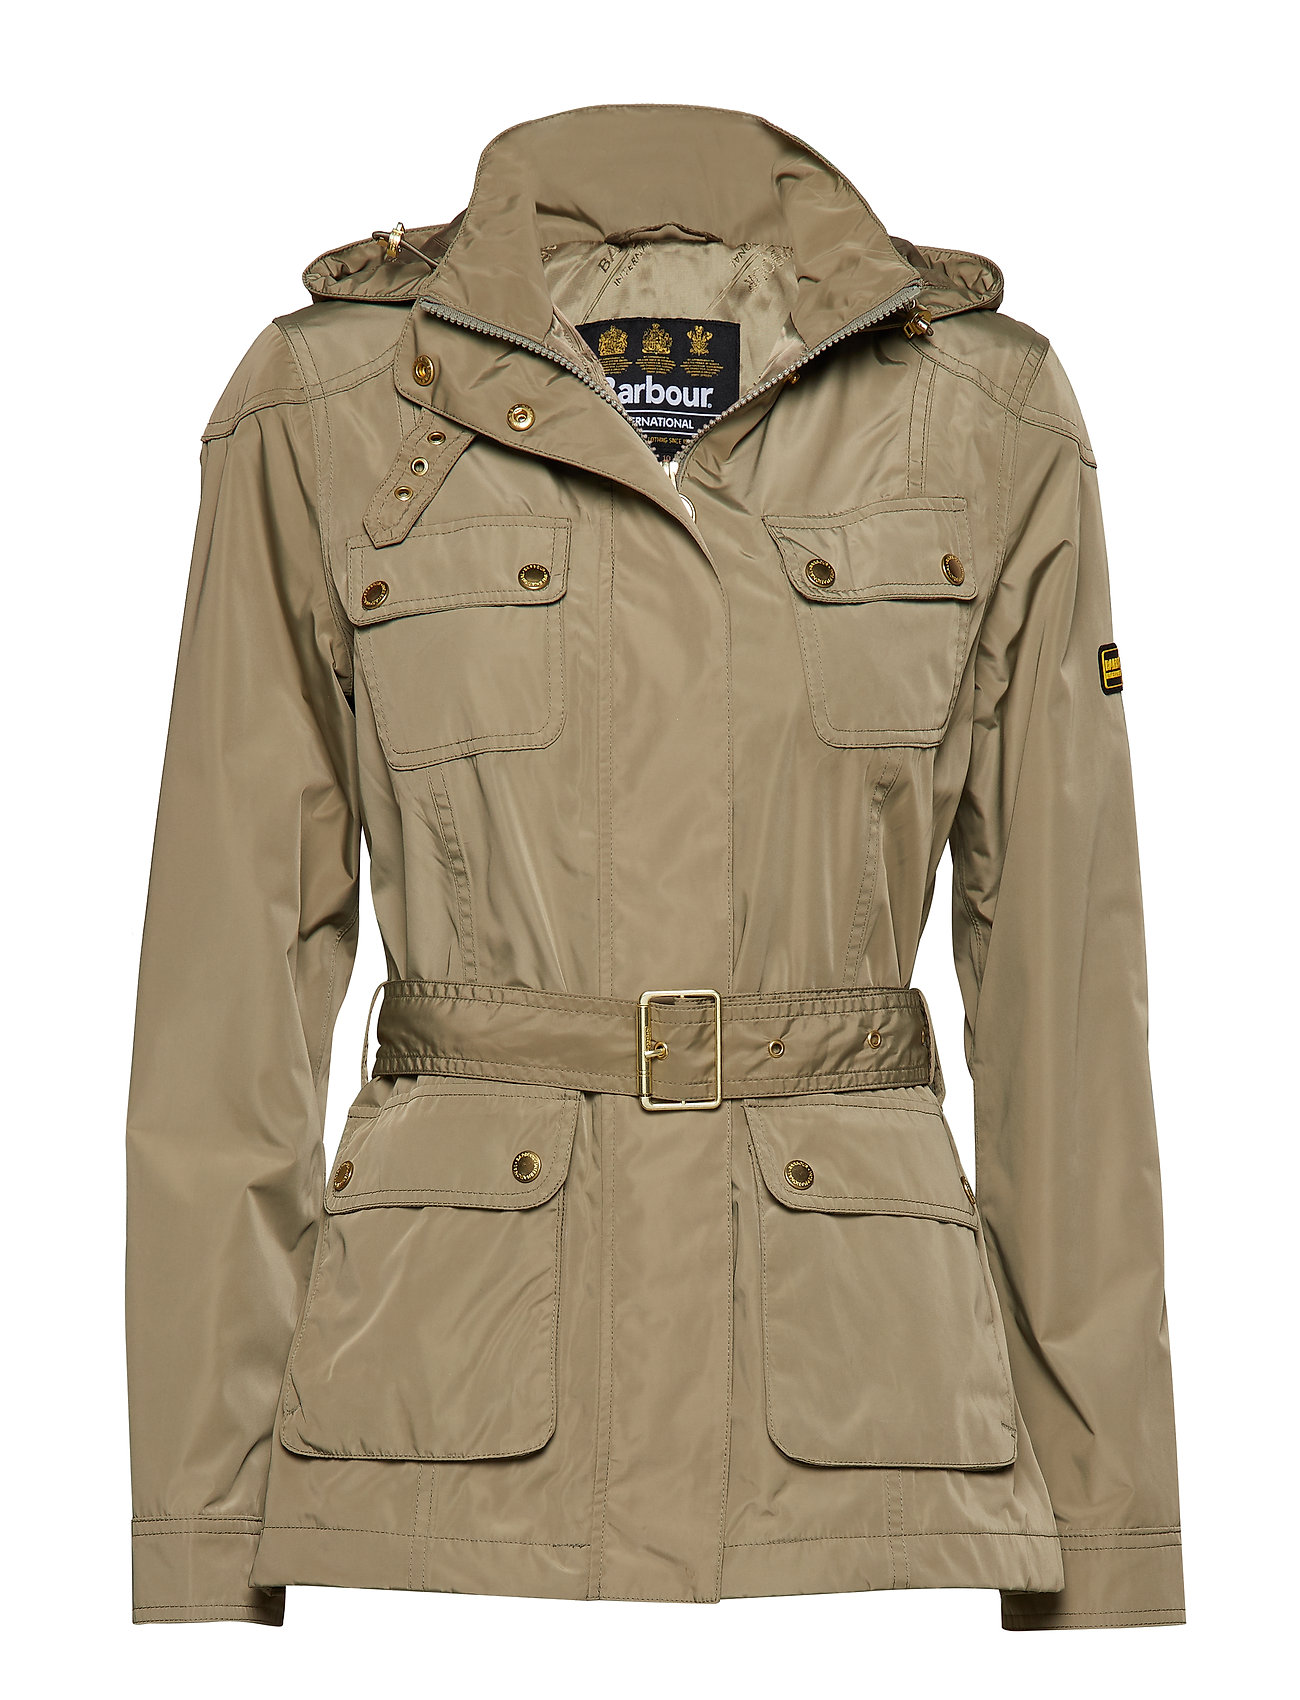 Barbour B.Intl Division Jacket